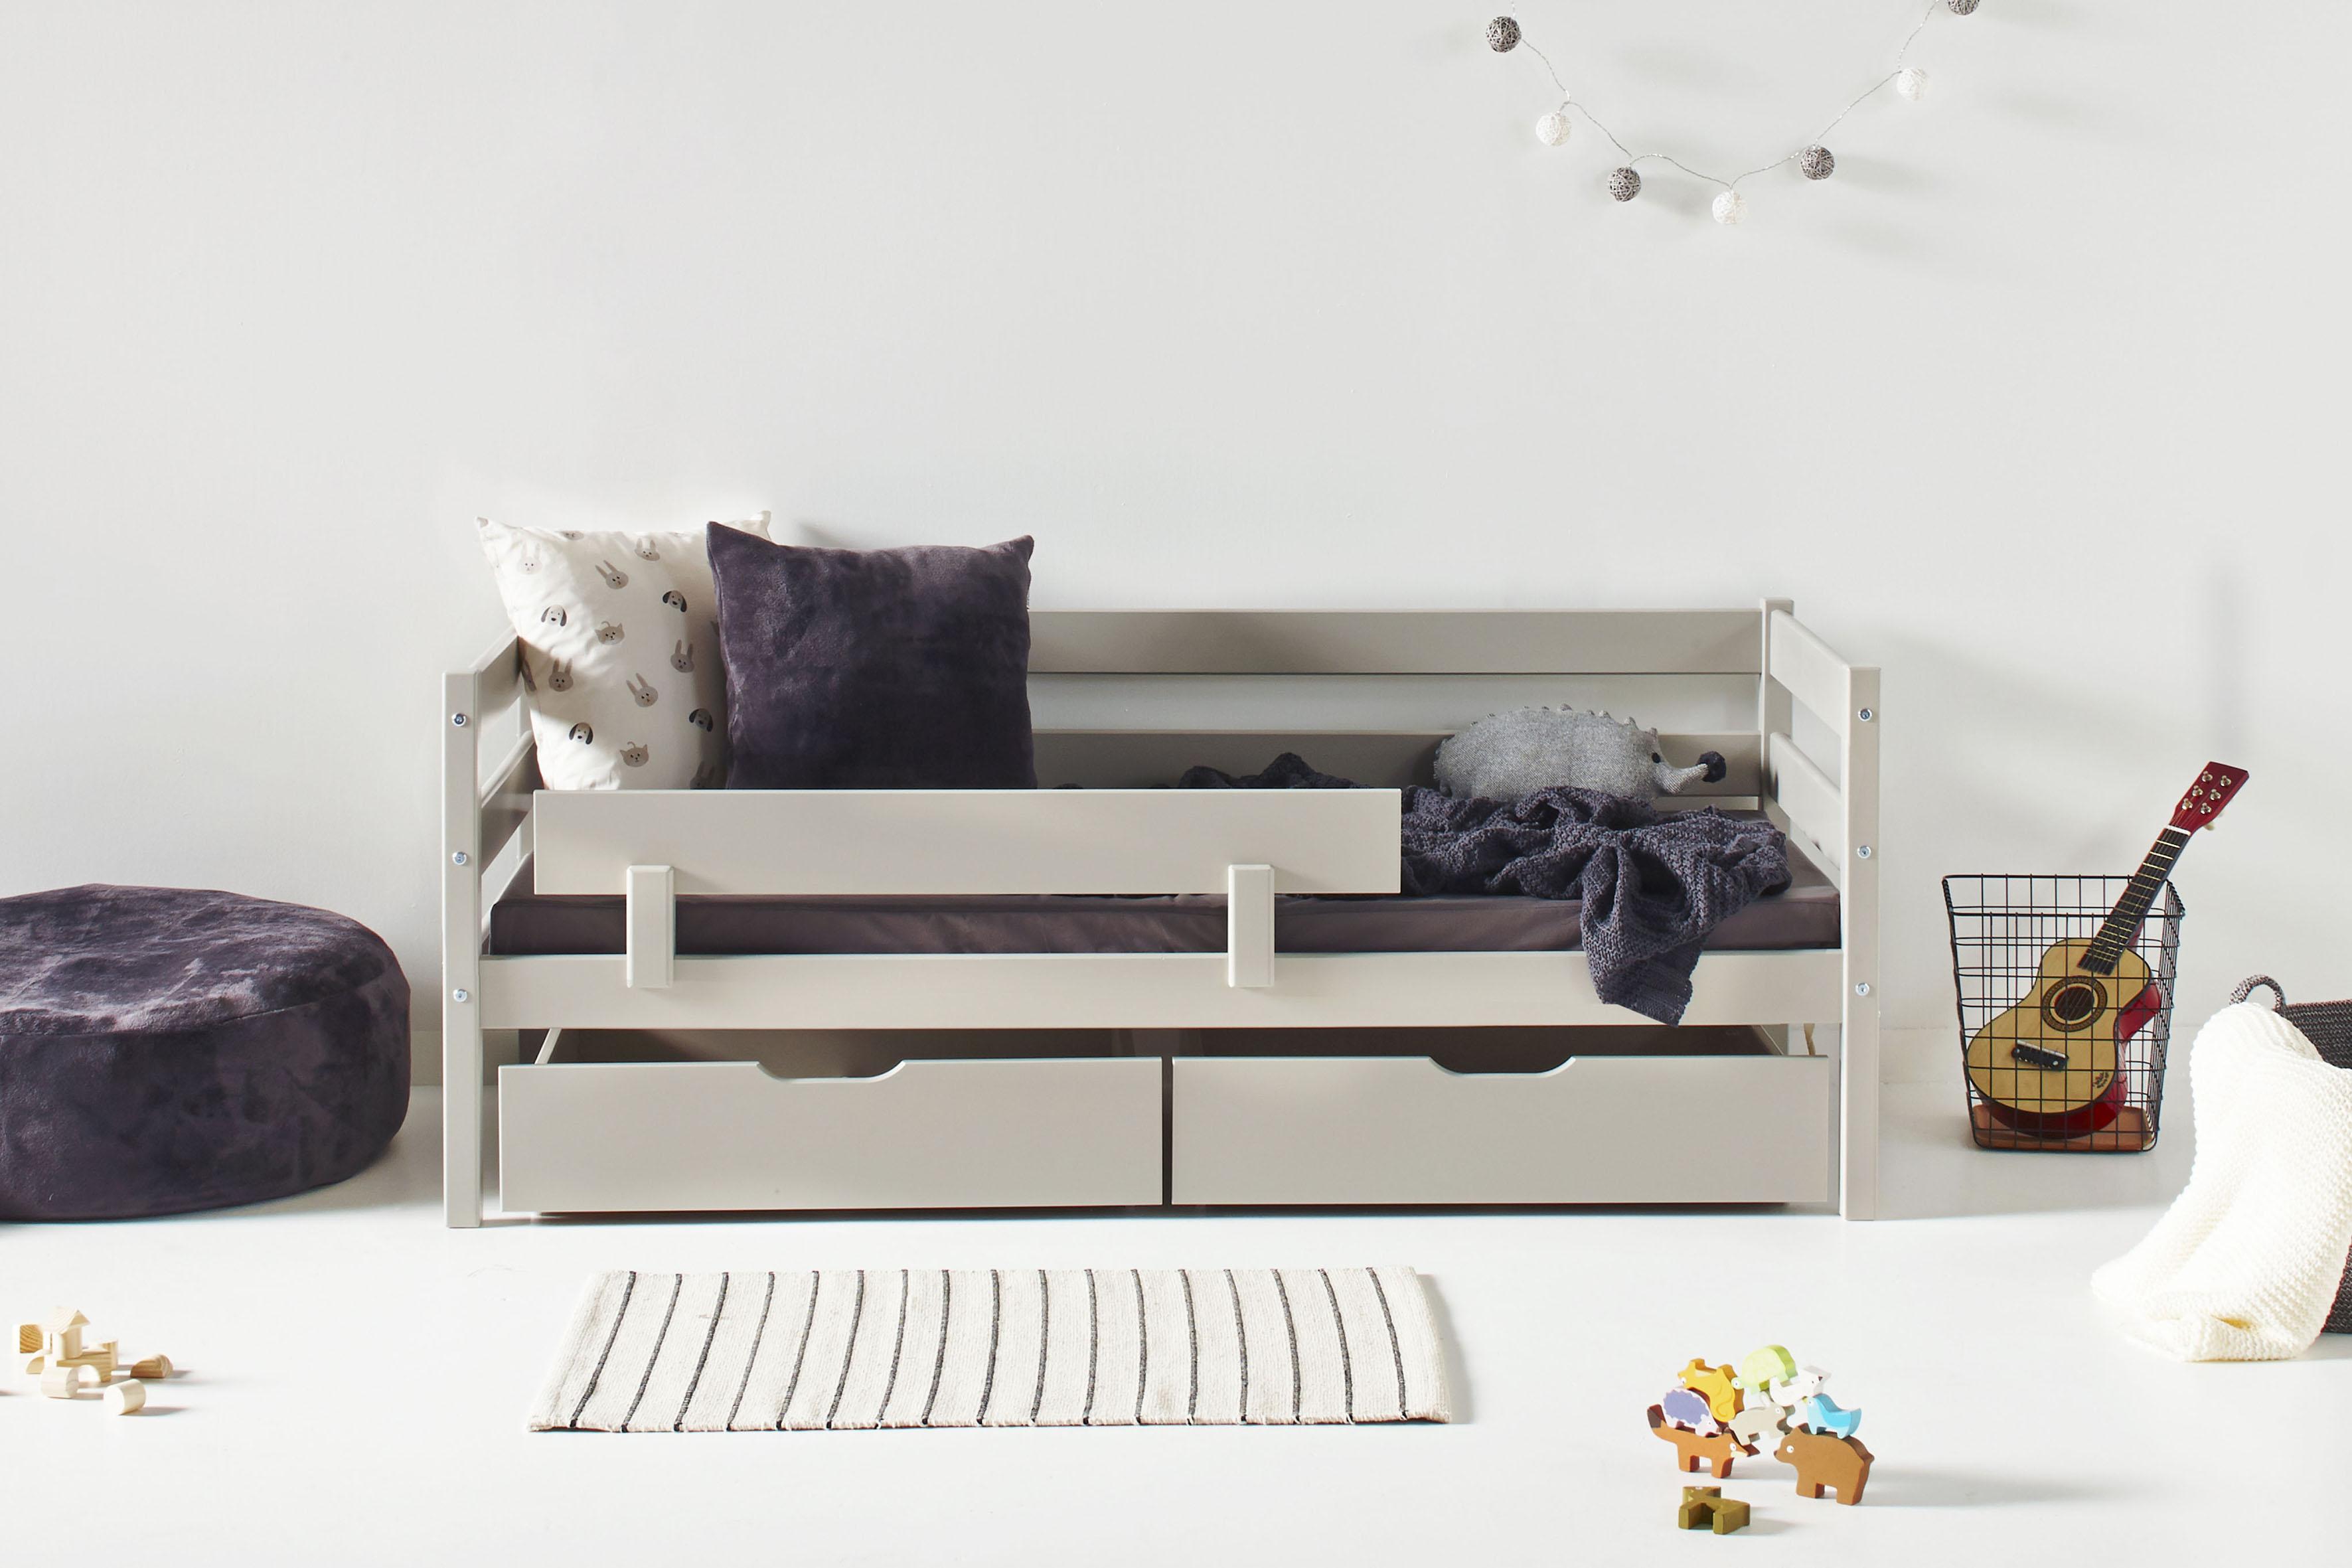 hoppekids kinderbett inkl matratze und rollrost bequem. Black Bedroom Furniture Sets. Home Design Ideas